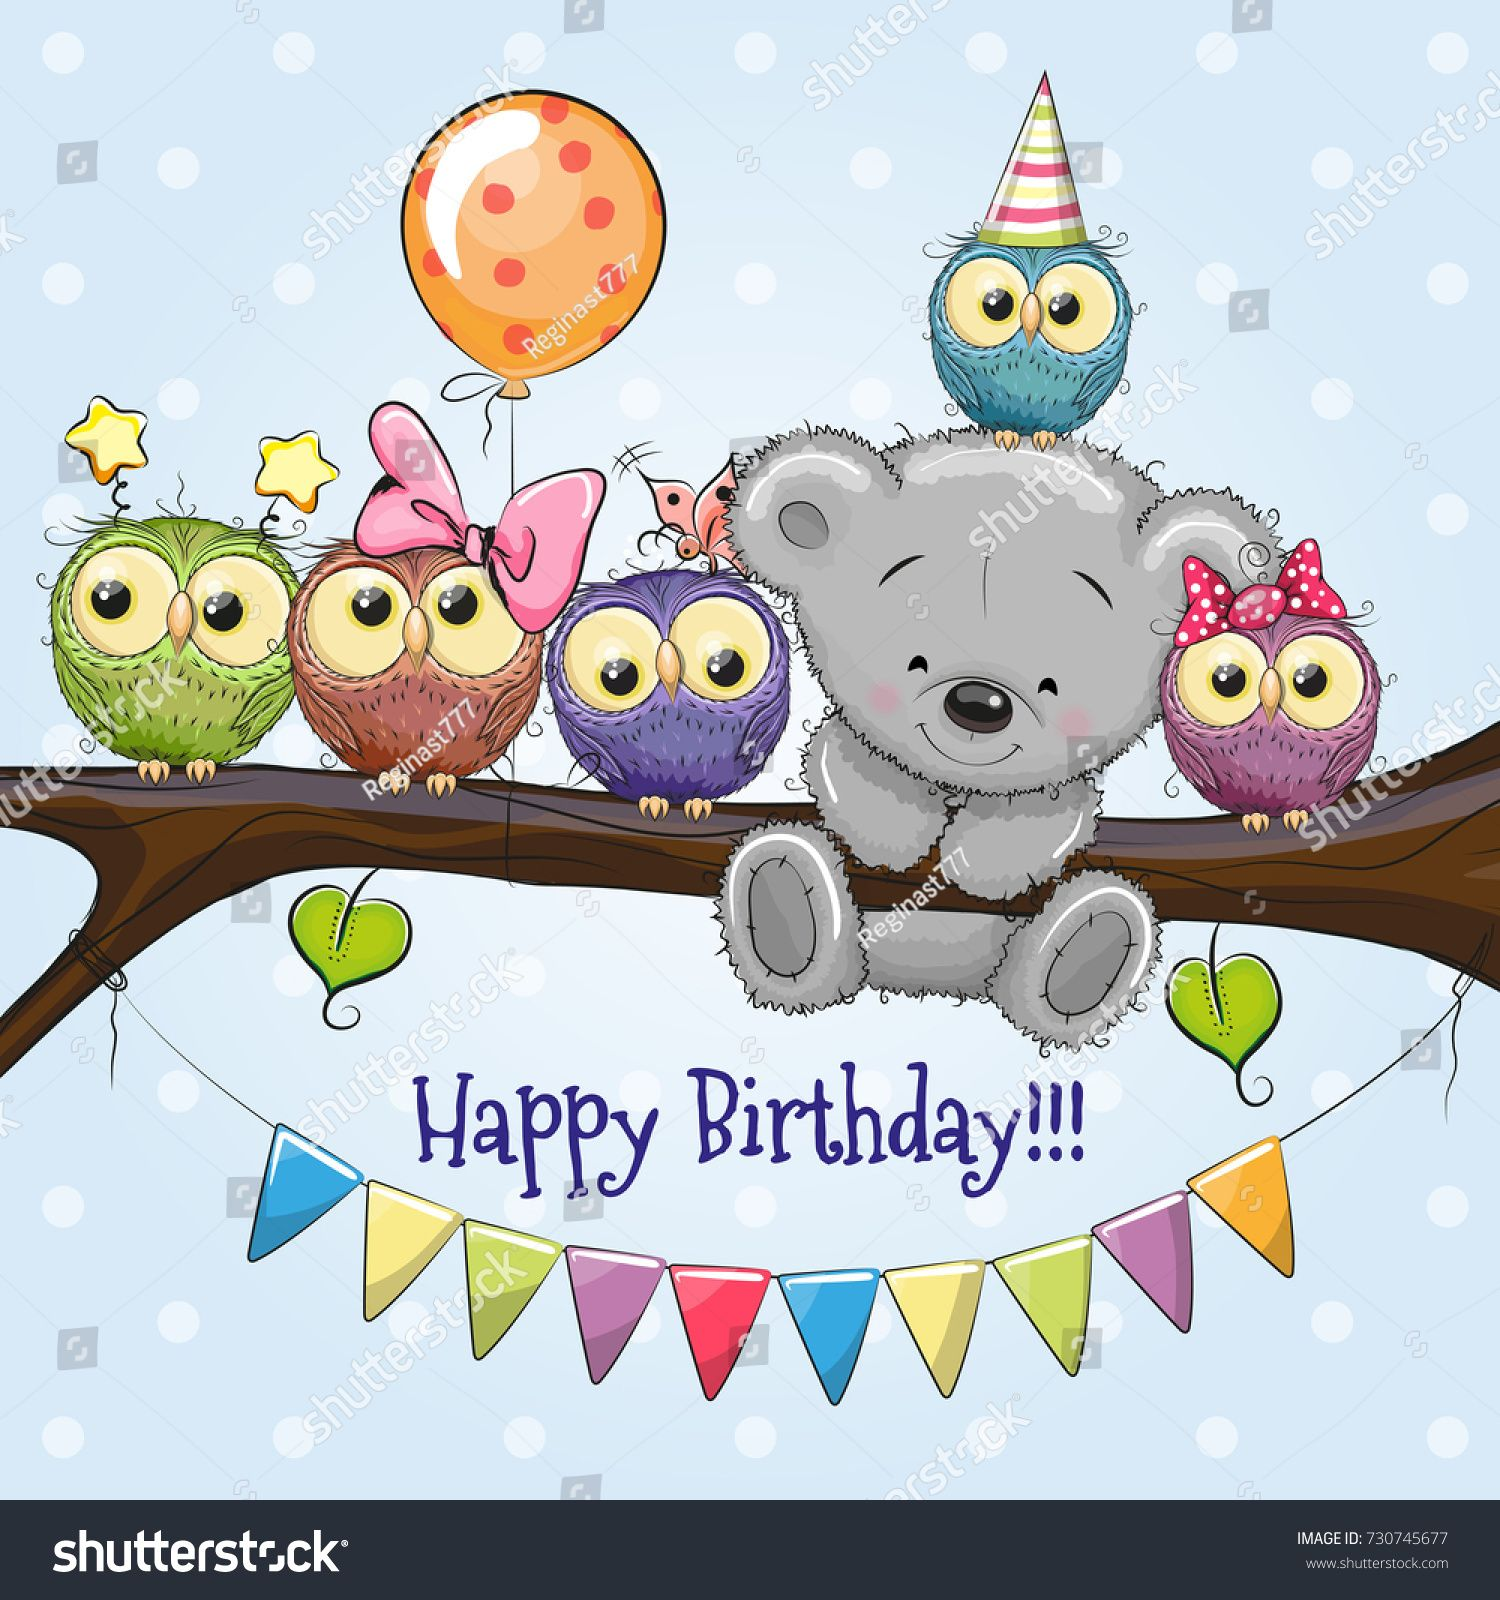 Illustration De Stock De Five Owls Bear On Branch Balloon 730745677 Carte Joyeux Anniversaire Joyeux Anniversaire Pour Enfants Carte Anniversaire